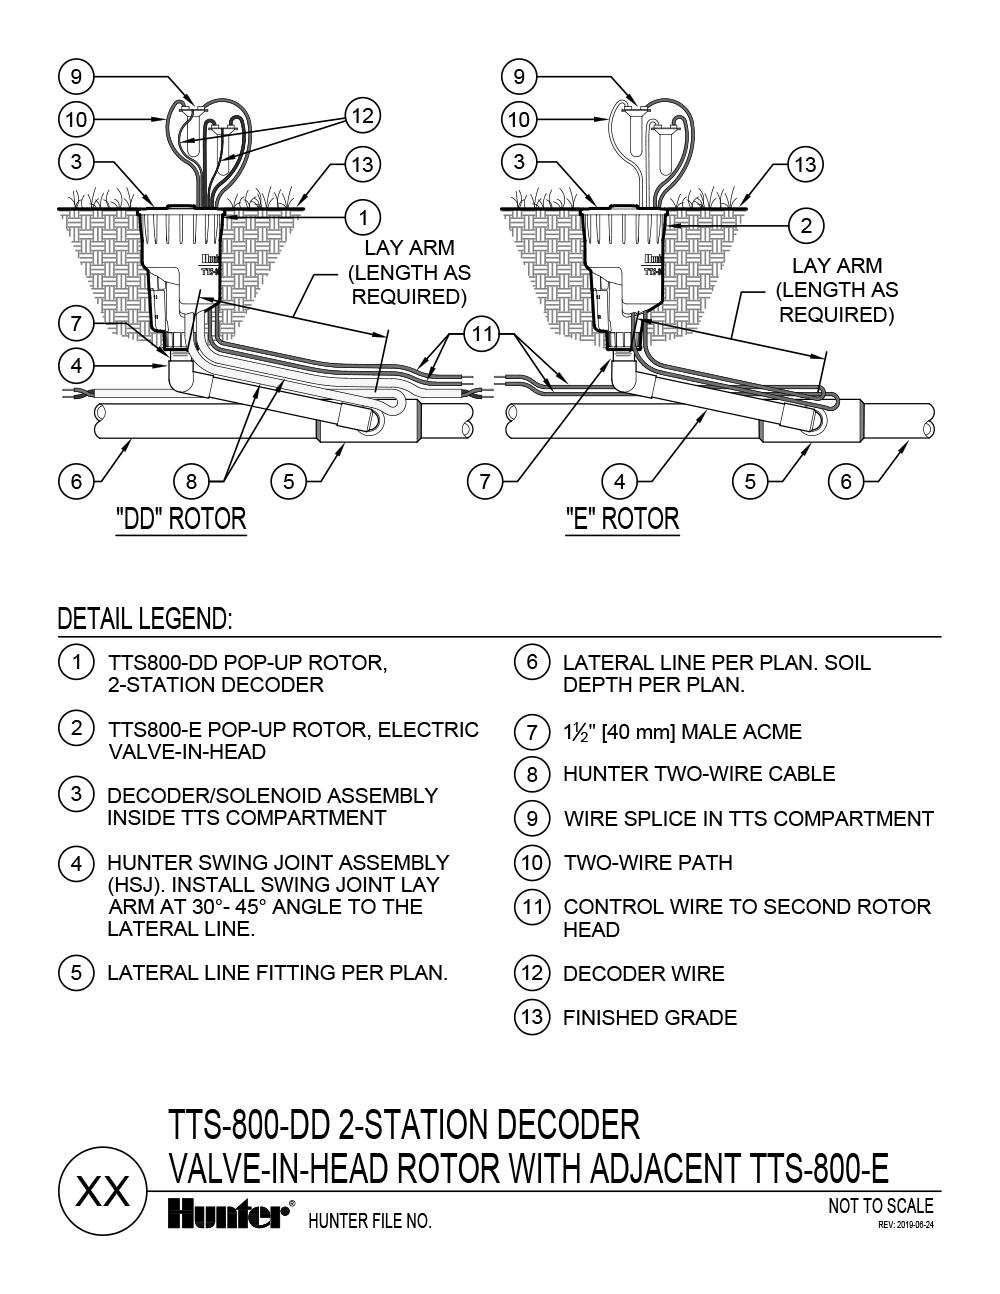 CAD - TTS-800-DD 2-Station Decoder with Adjacent TTS-800-E